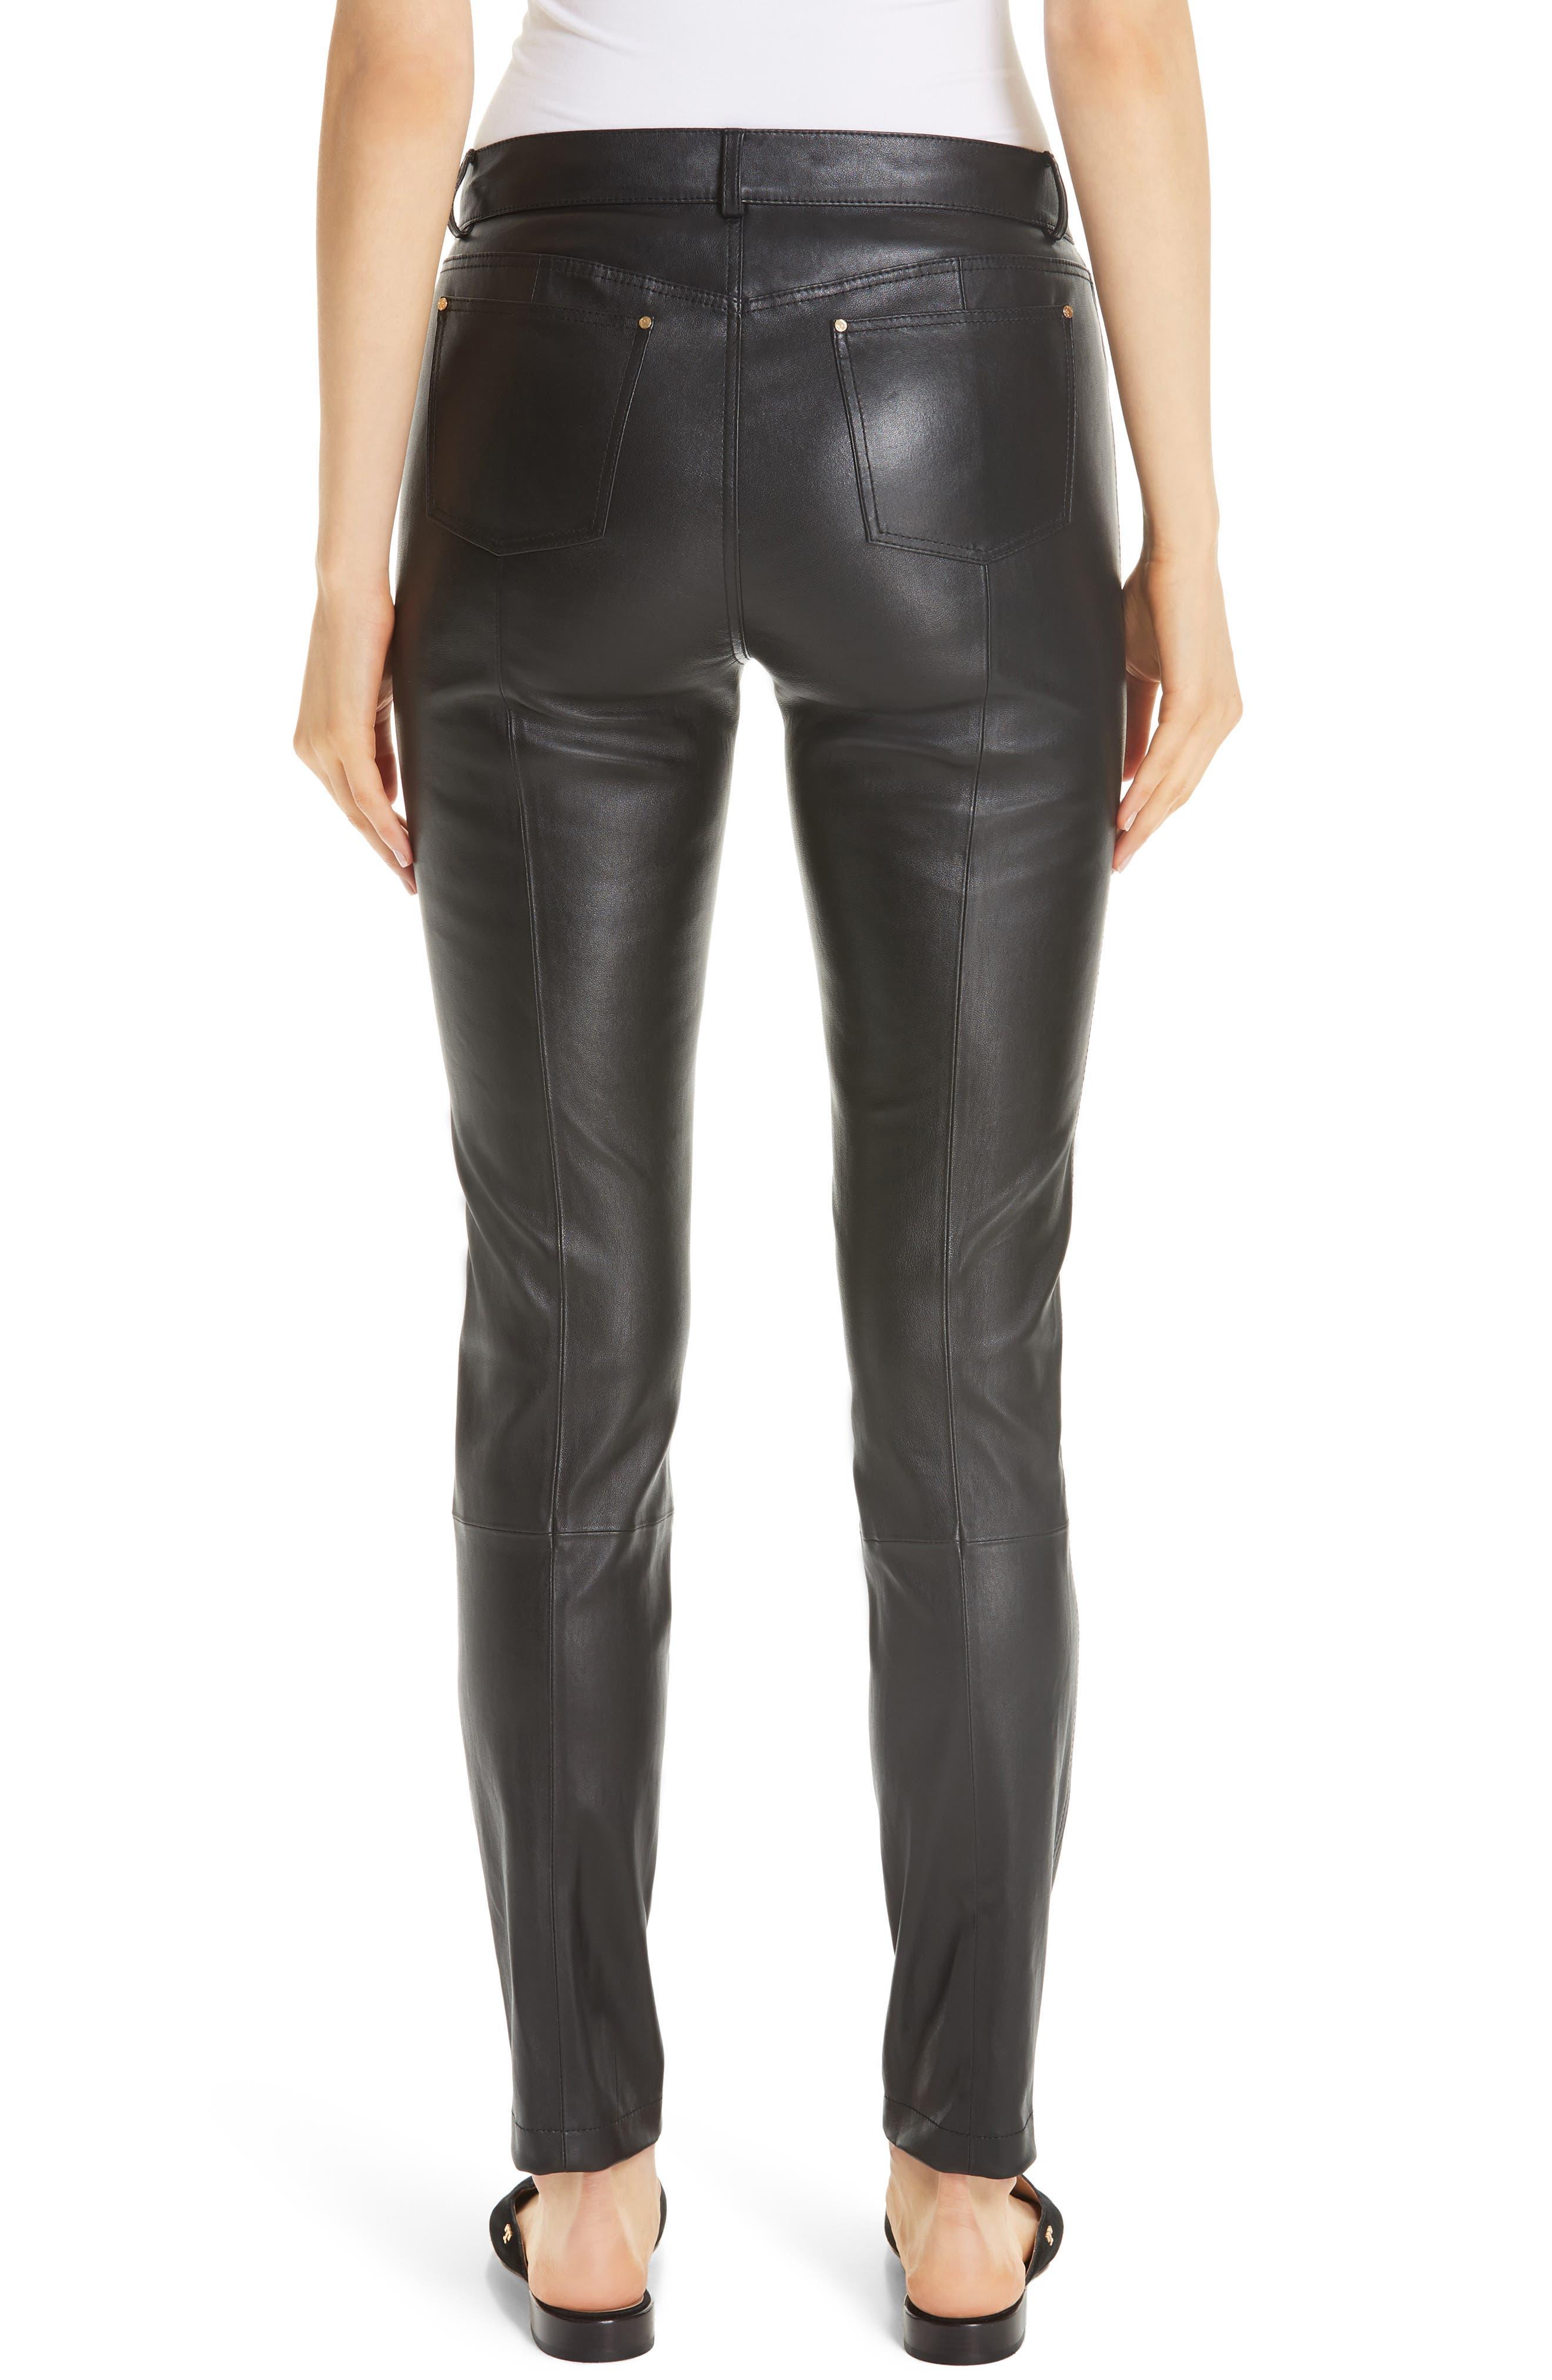 Mercer Nappa Leather Pants,                             Alternate thumbnail 2, color,                             BLACK